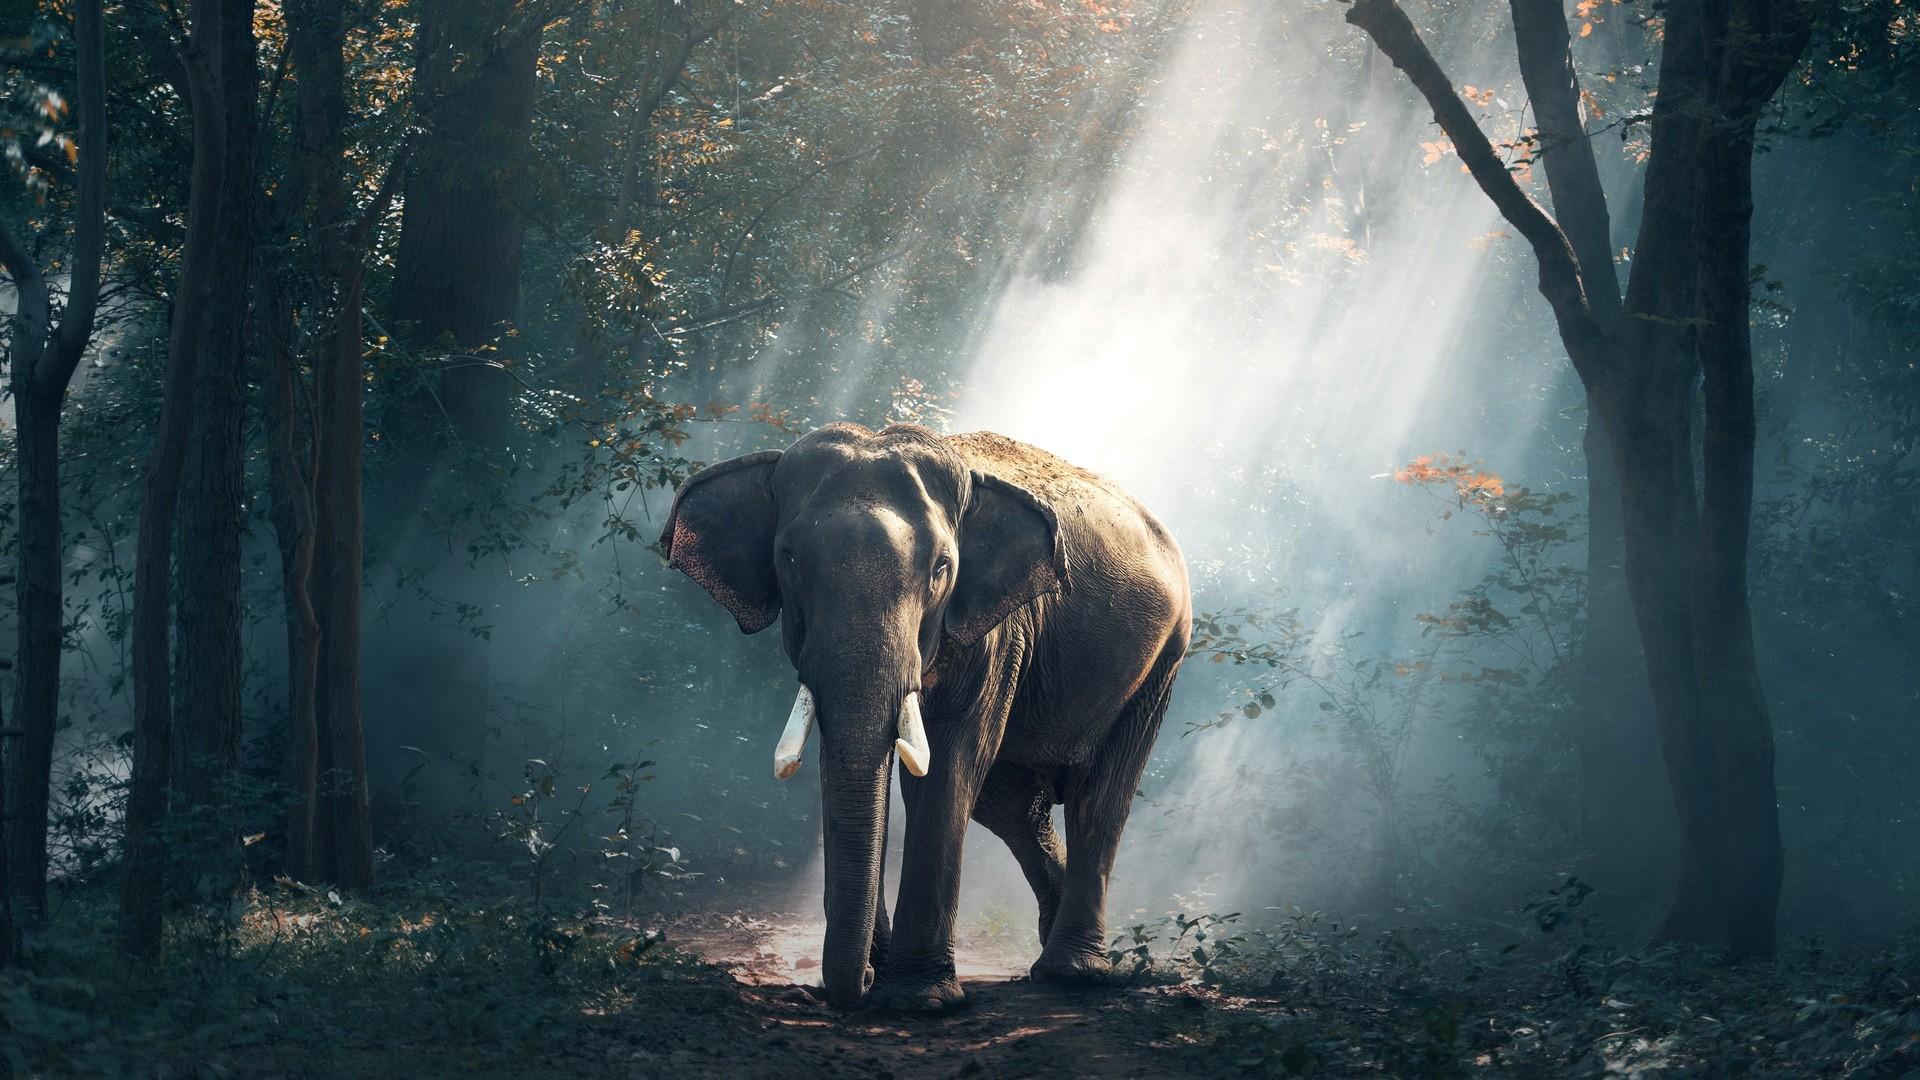 Res: 1920x1080, elephant-s2.jpg